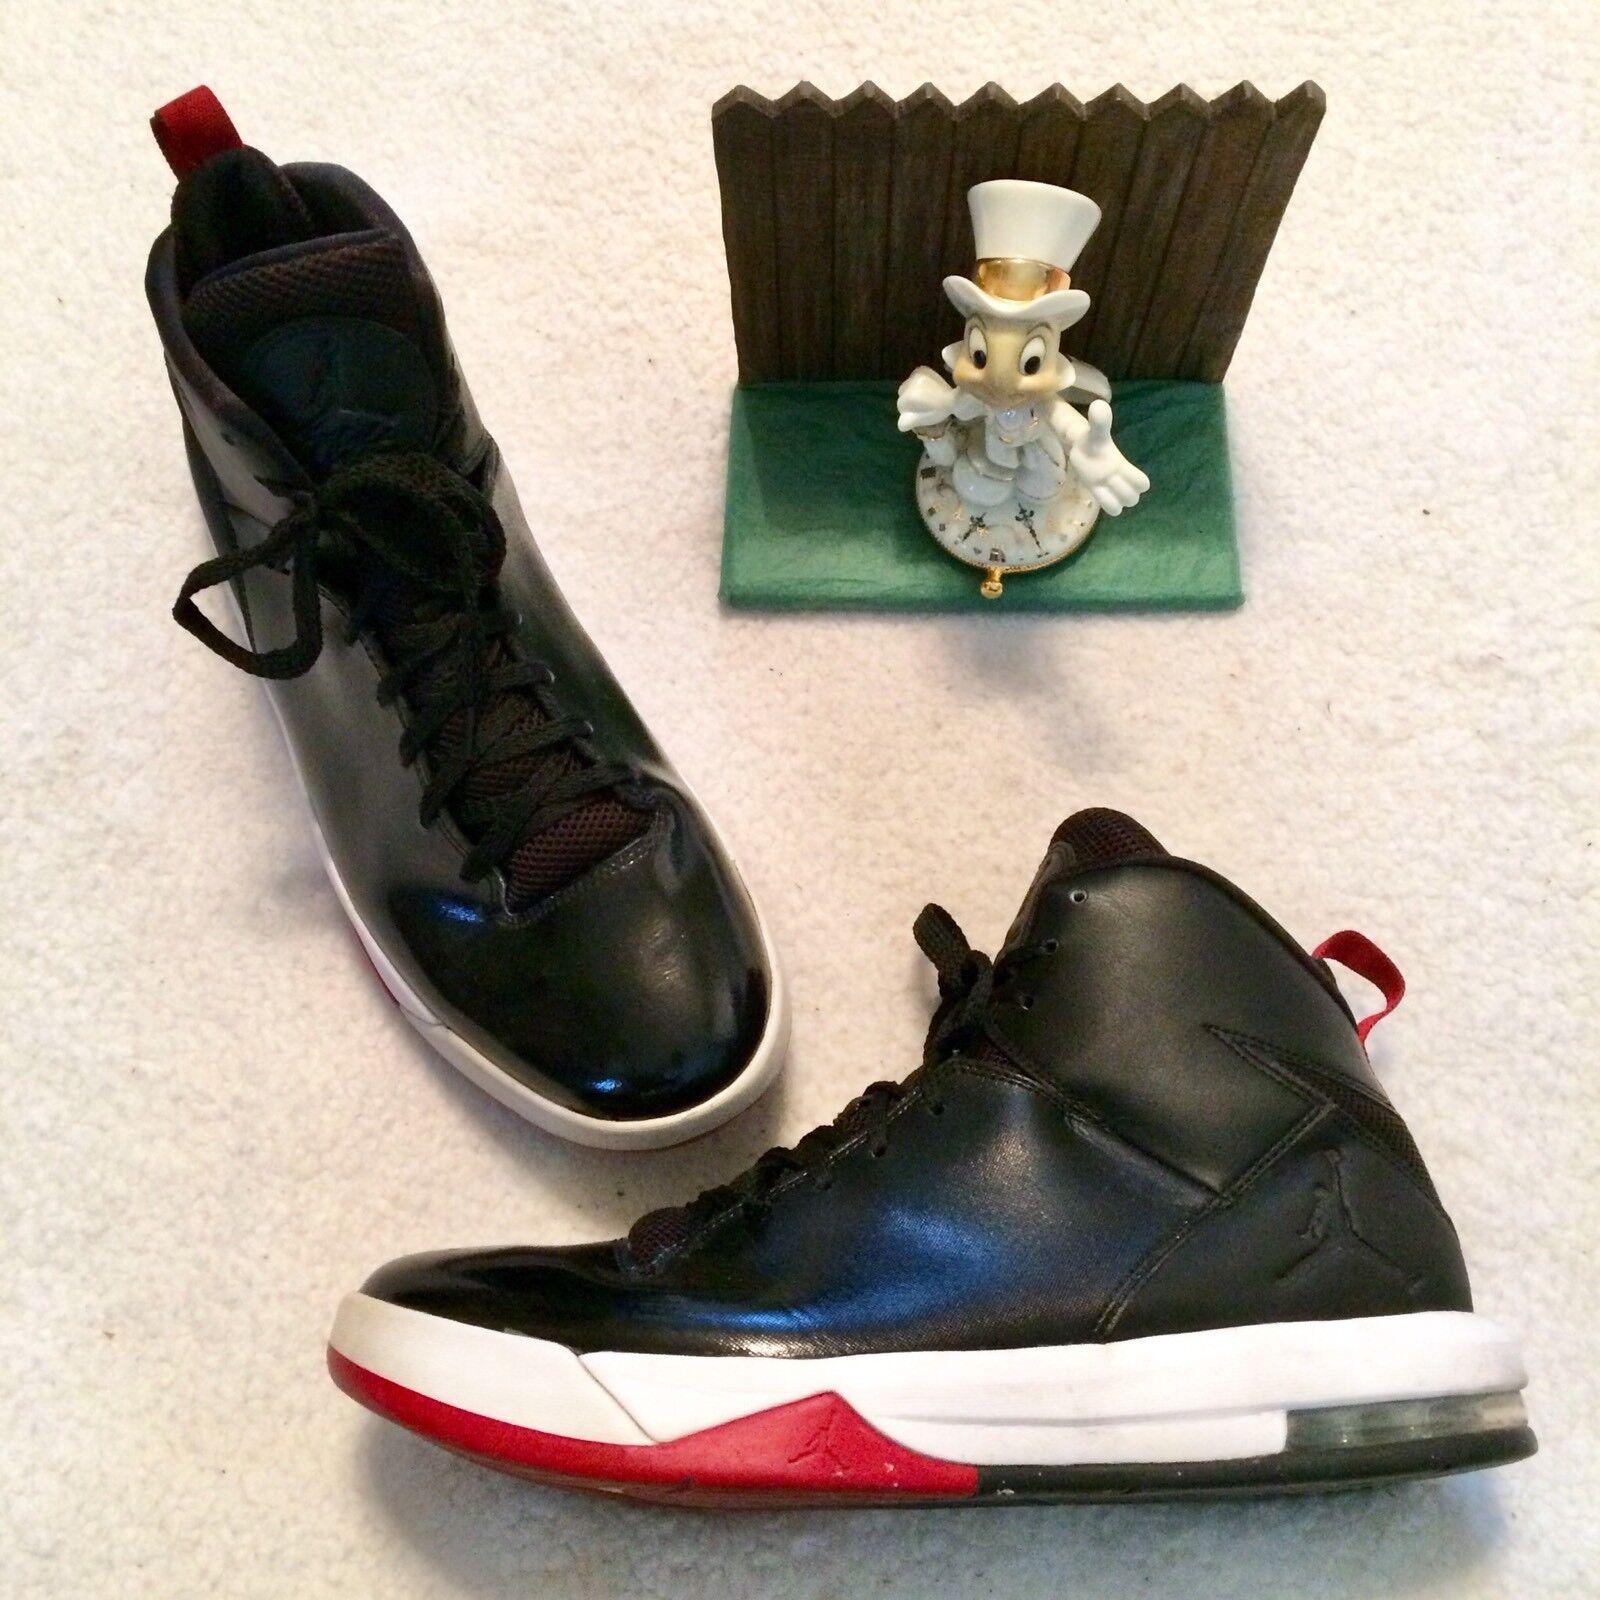 Air Jordan Imminent Men's Basketball Shoes, 705077-001 Size Minimal Wear